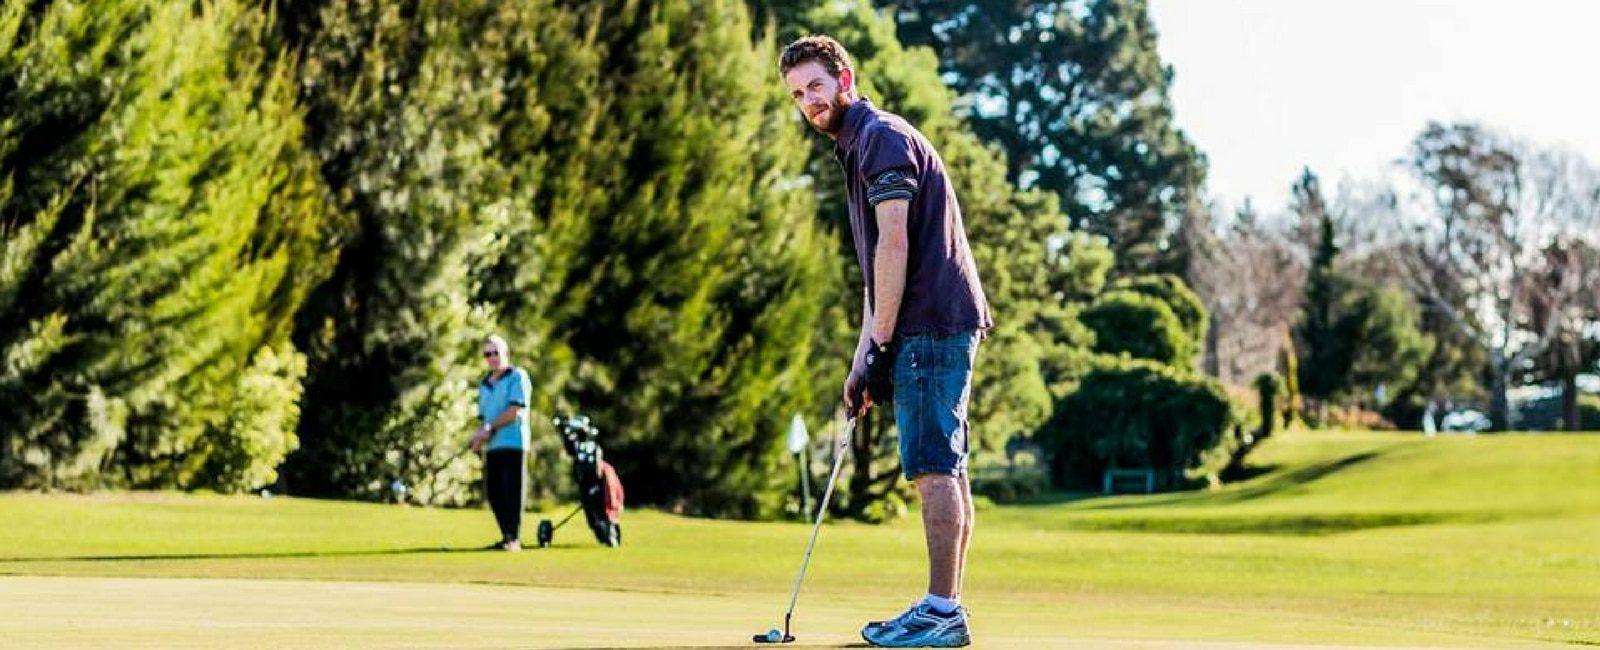 HBT-SeeDo-SportsAdventure-Golf-KaramuGolfClub-1600x650